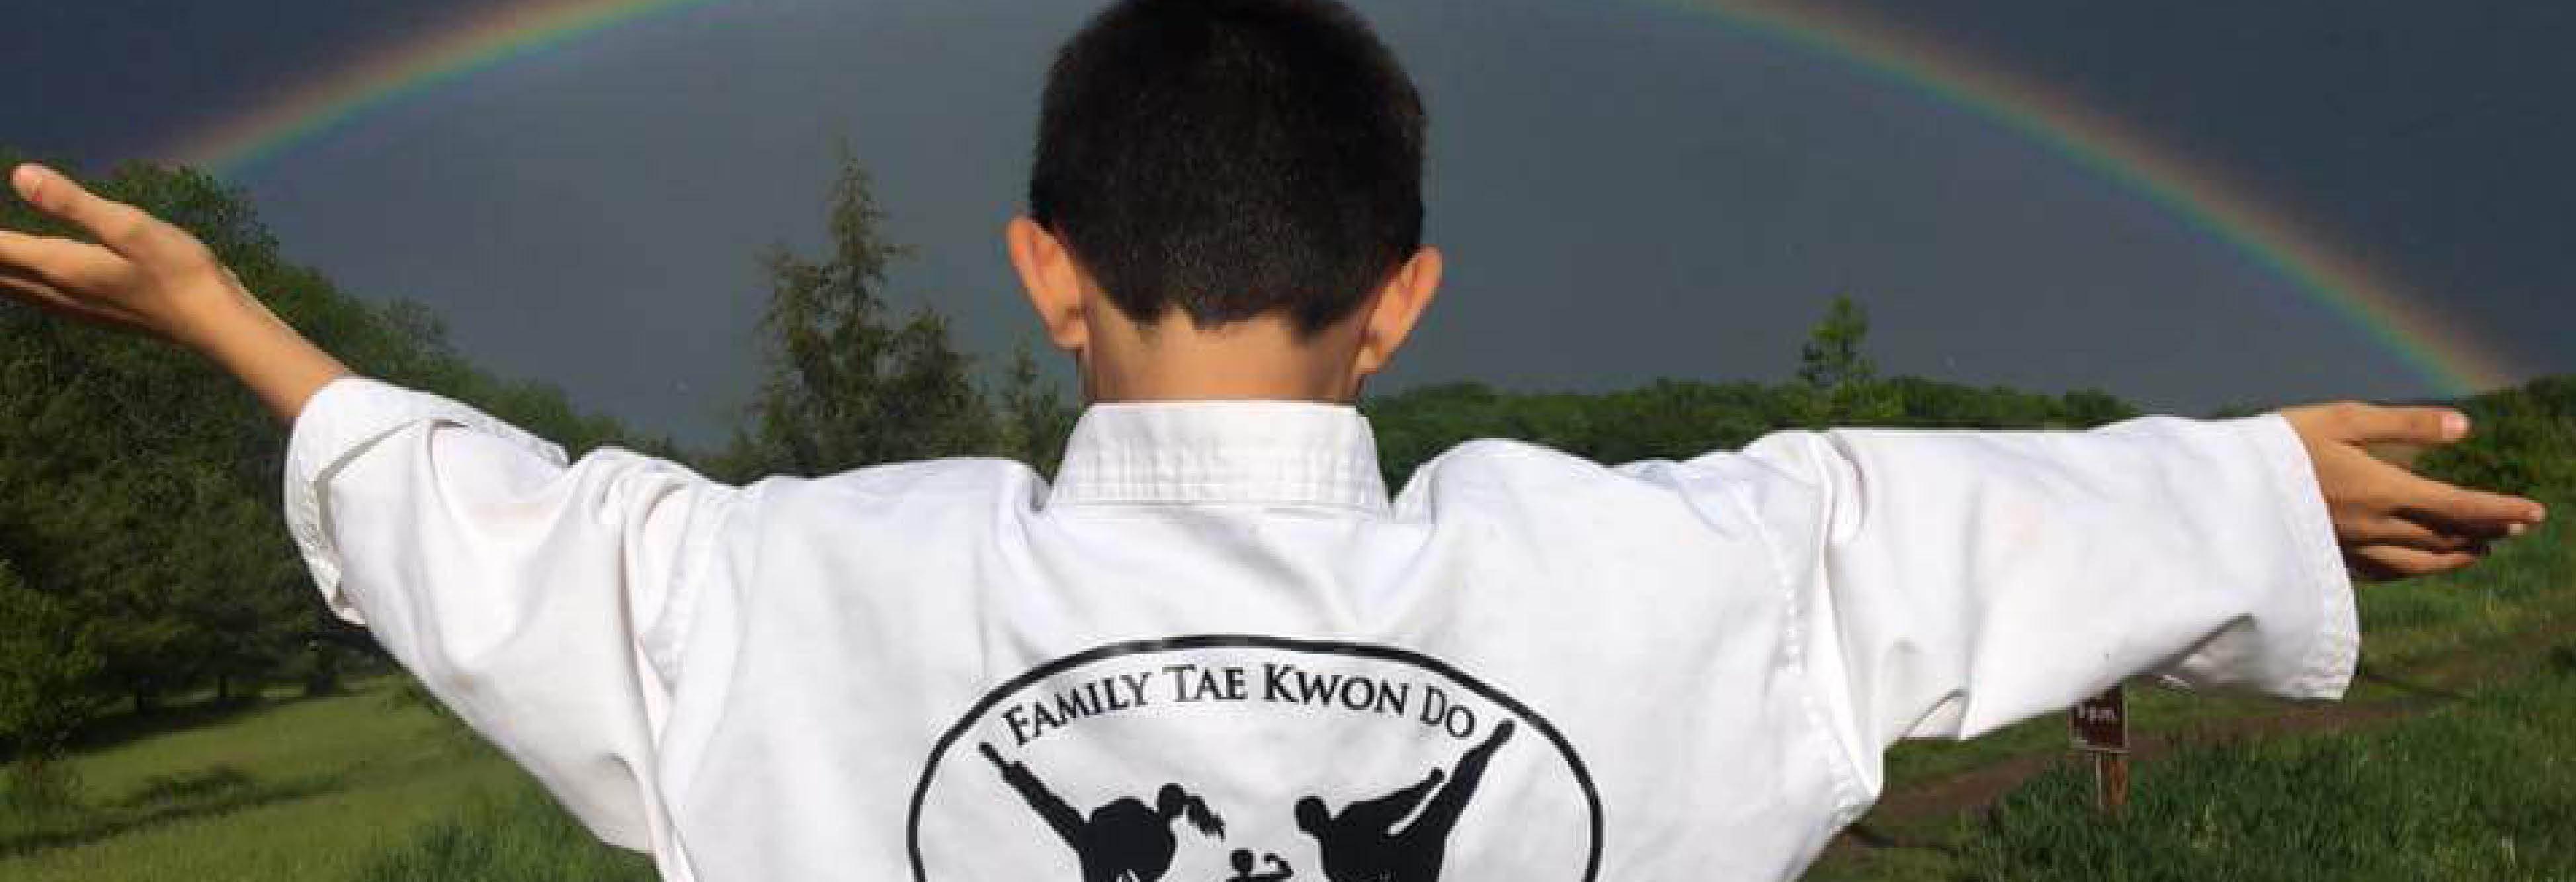 Family Tae Kwon Do Champions Menomonee falls Logo